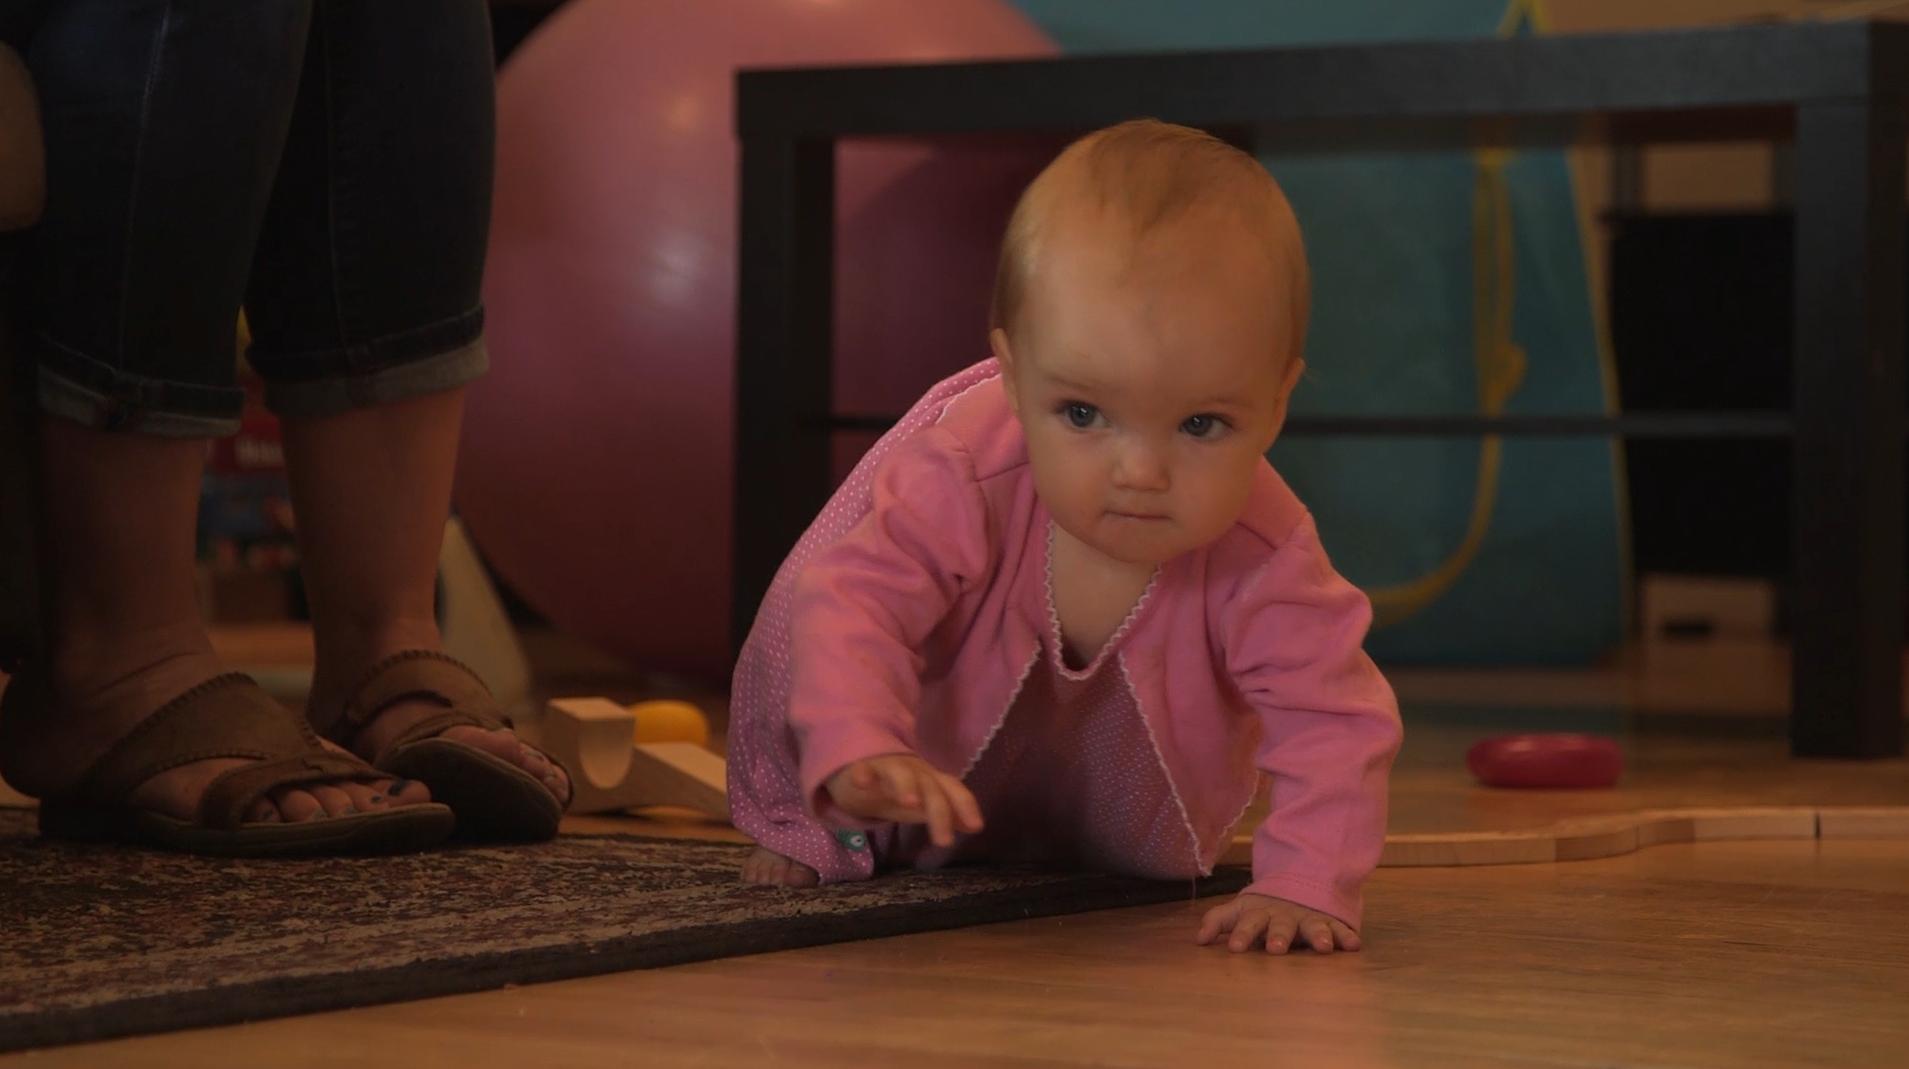 Baby crawling across floor